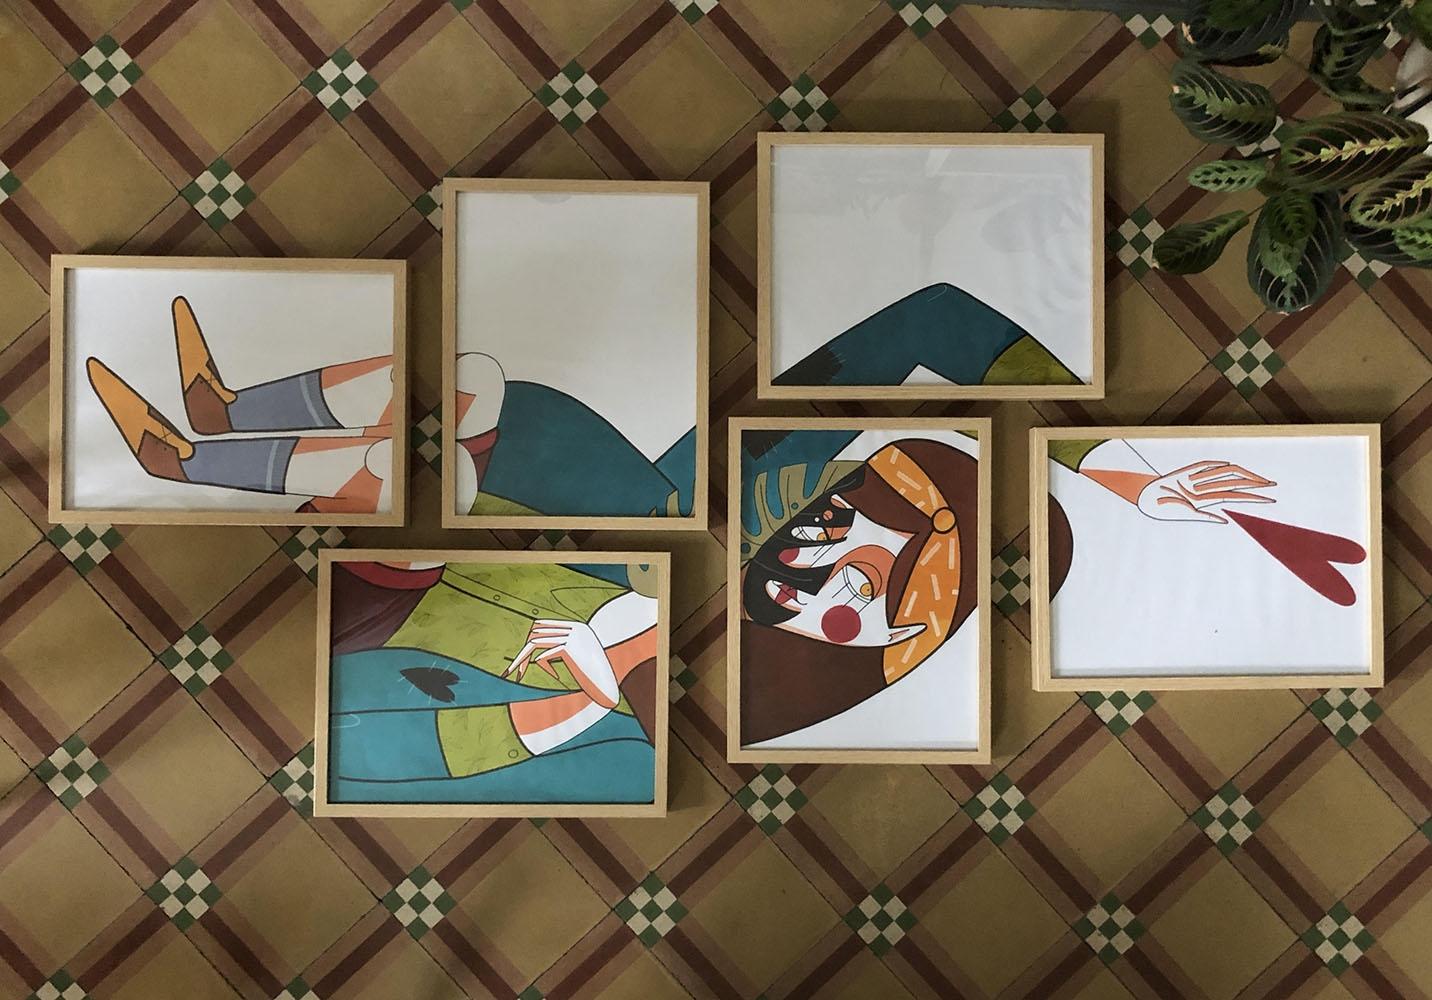 illustrazioni vinli